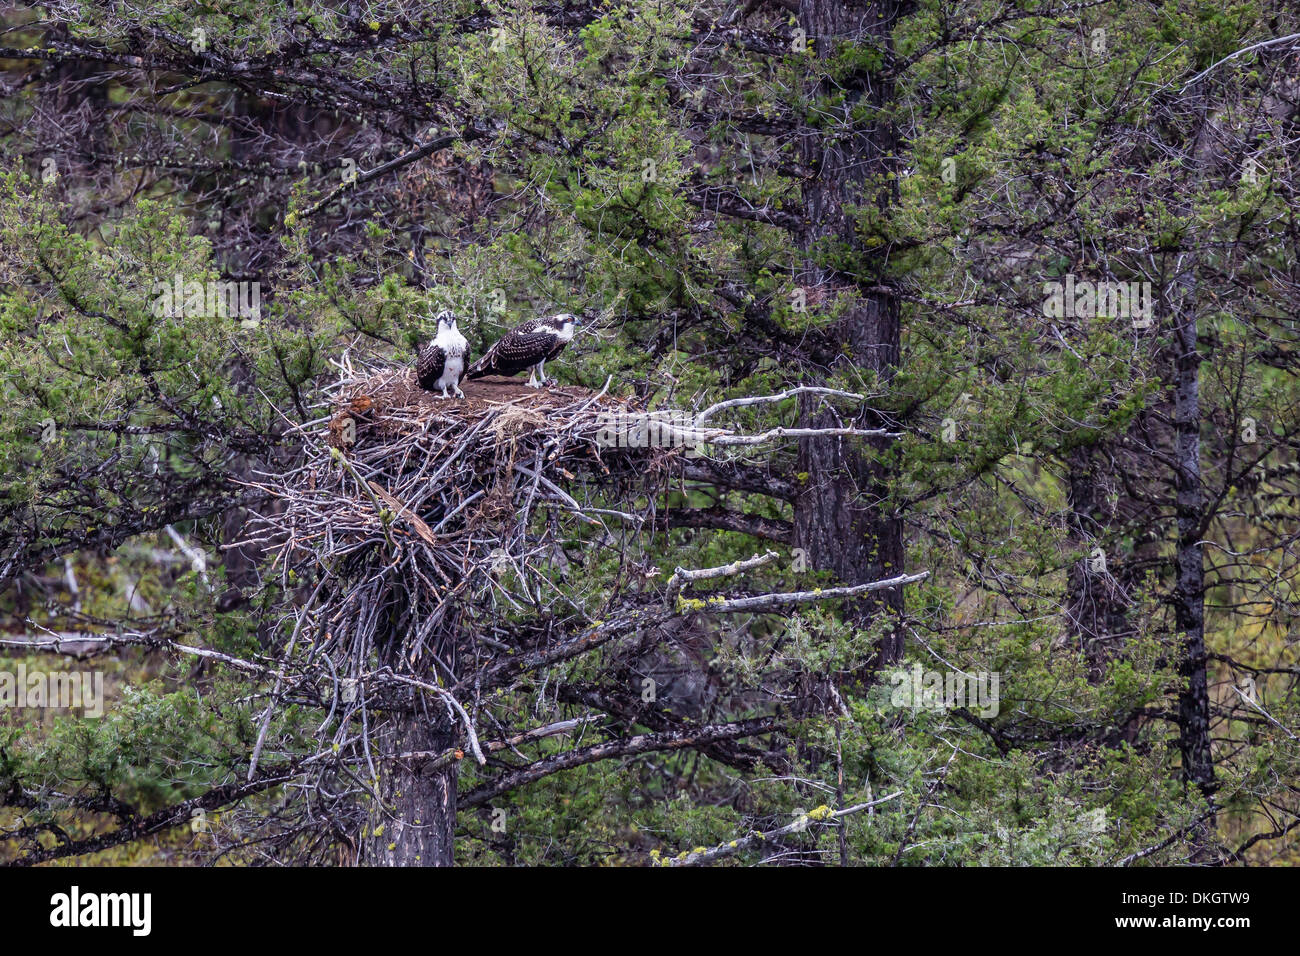 Osprey (Pandion haliaetus) fledglings on nest, Yellowstone National Park, UNESCO World Heritage Site, Wyoming, USA - Stock Image